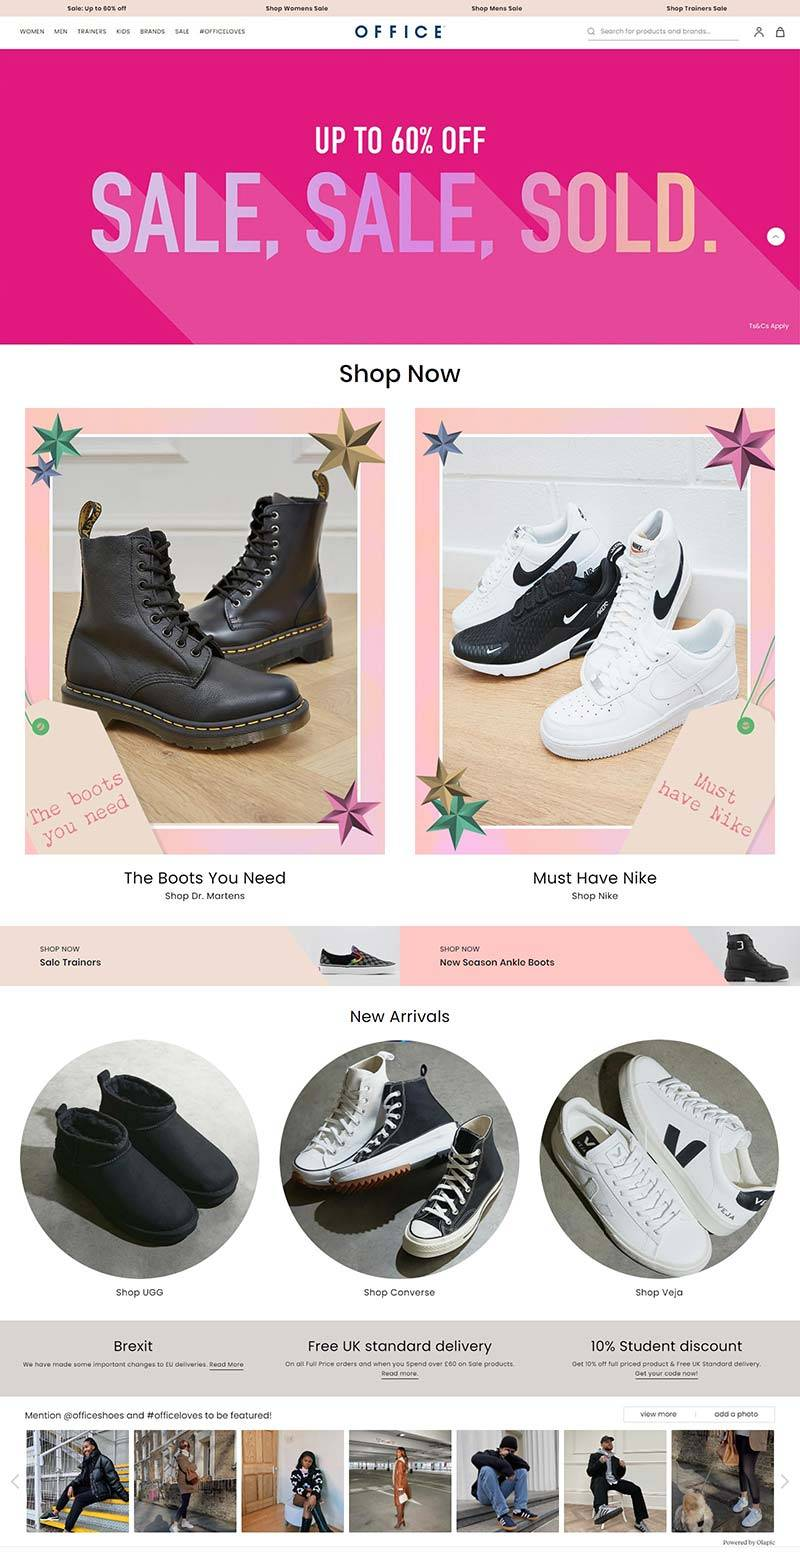 Office Shoes 英国时尚鞋履品牌网站